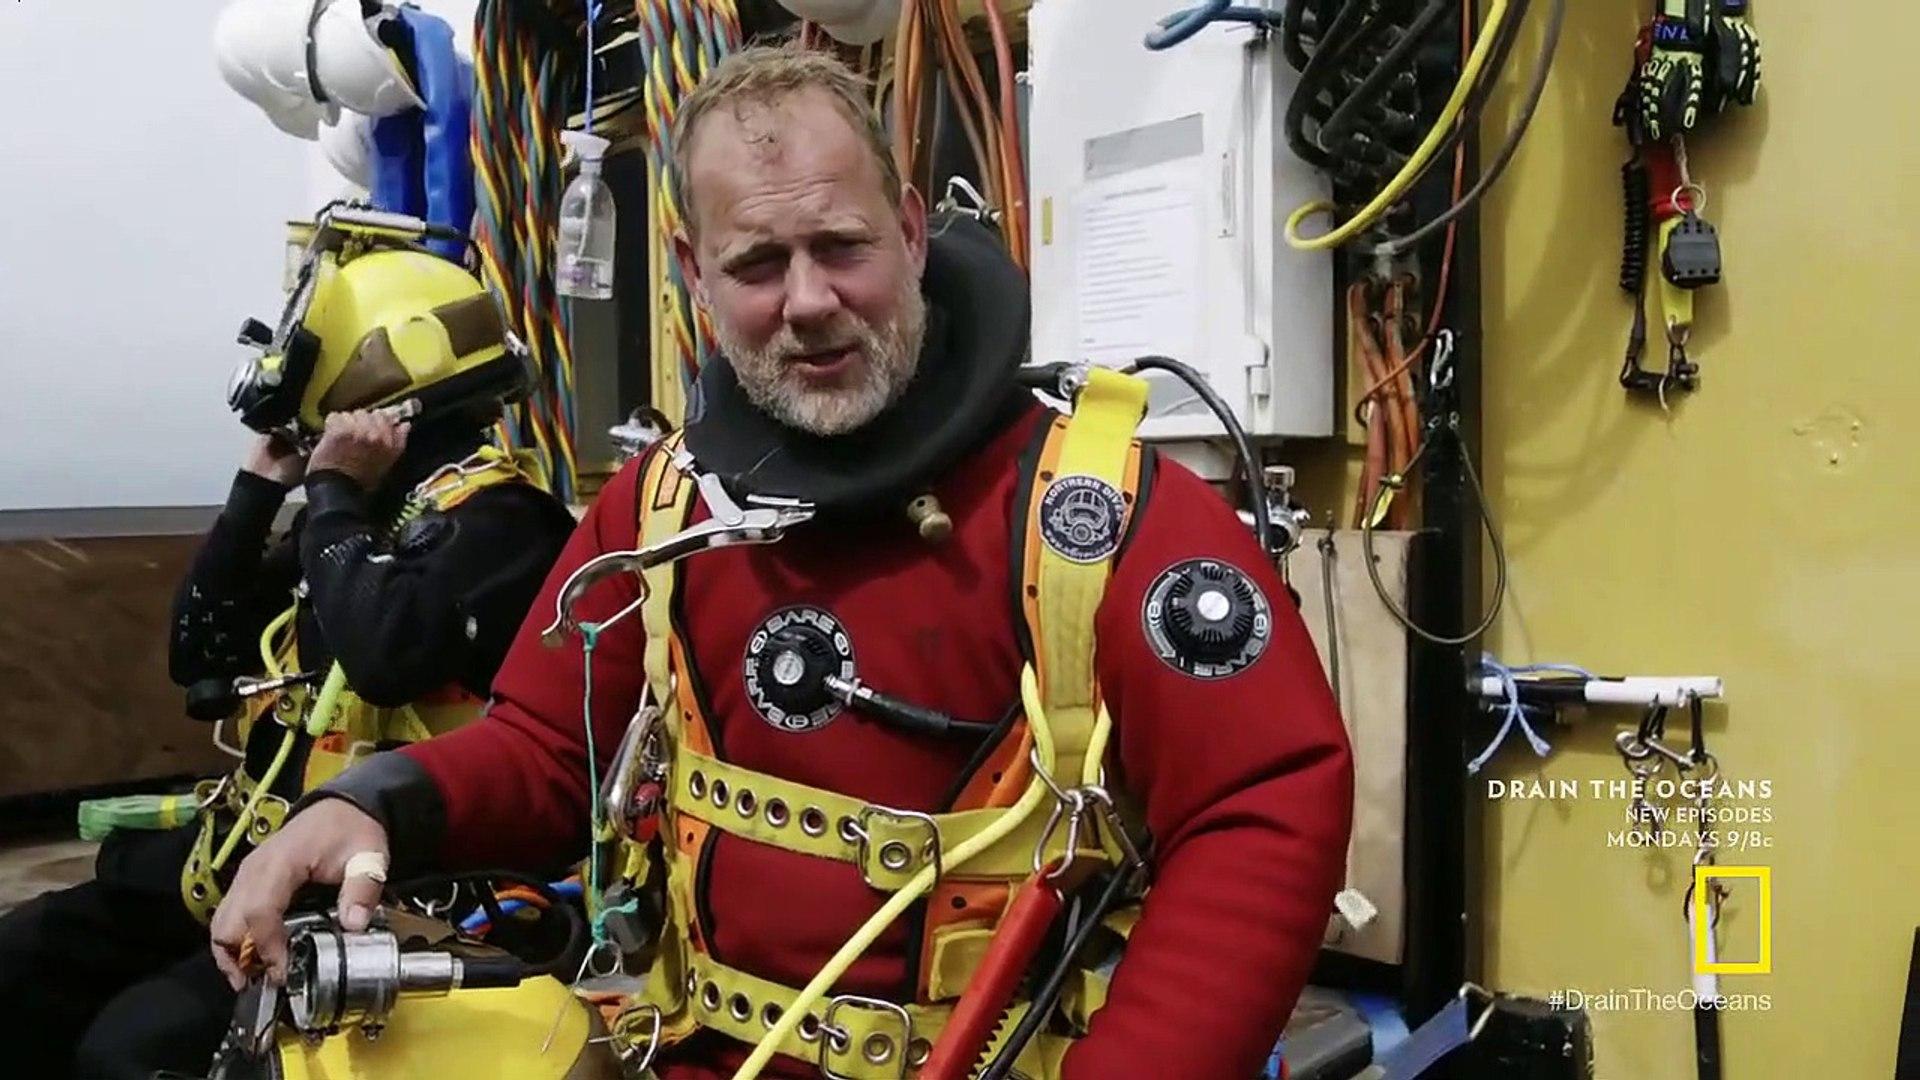 [Documentary] Drain the Oceans Series 1 Sunken Treasures